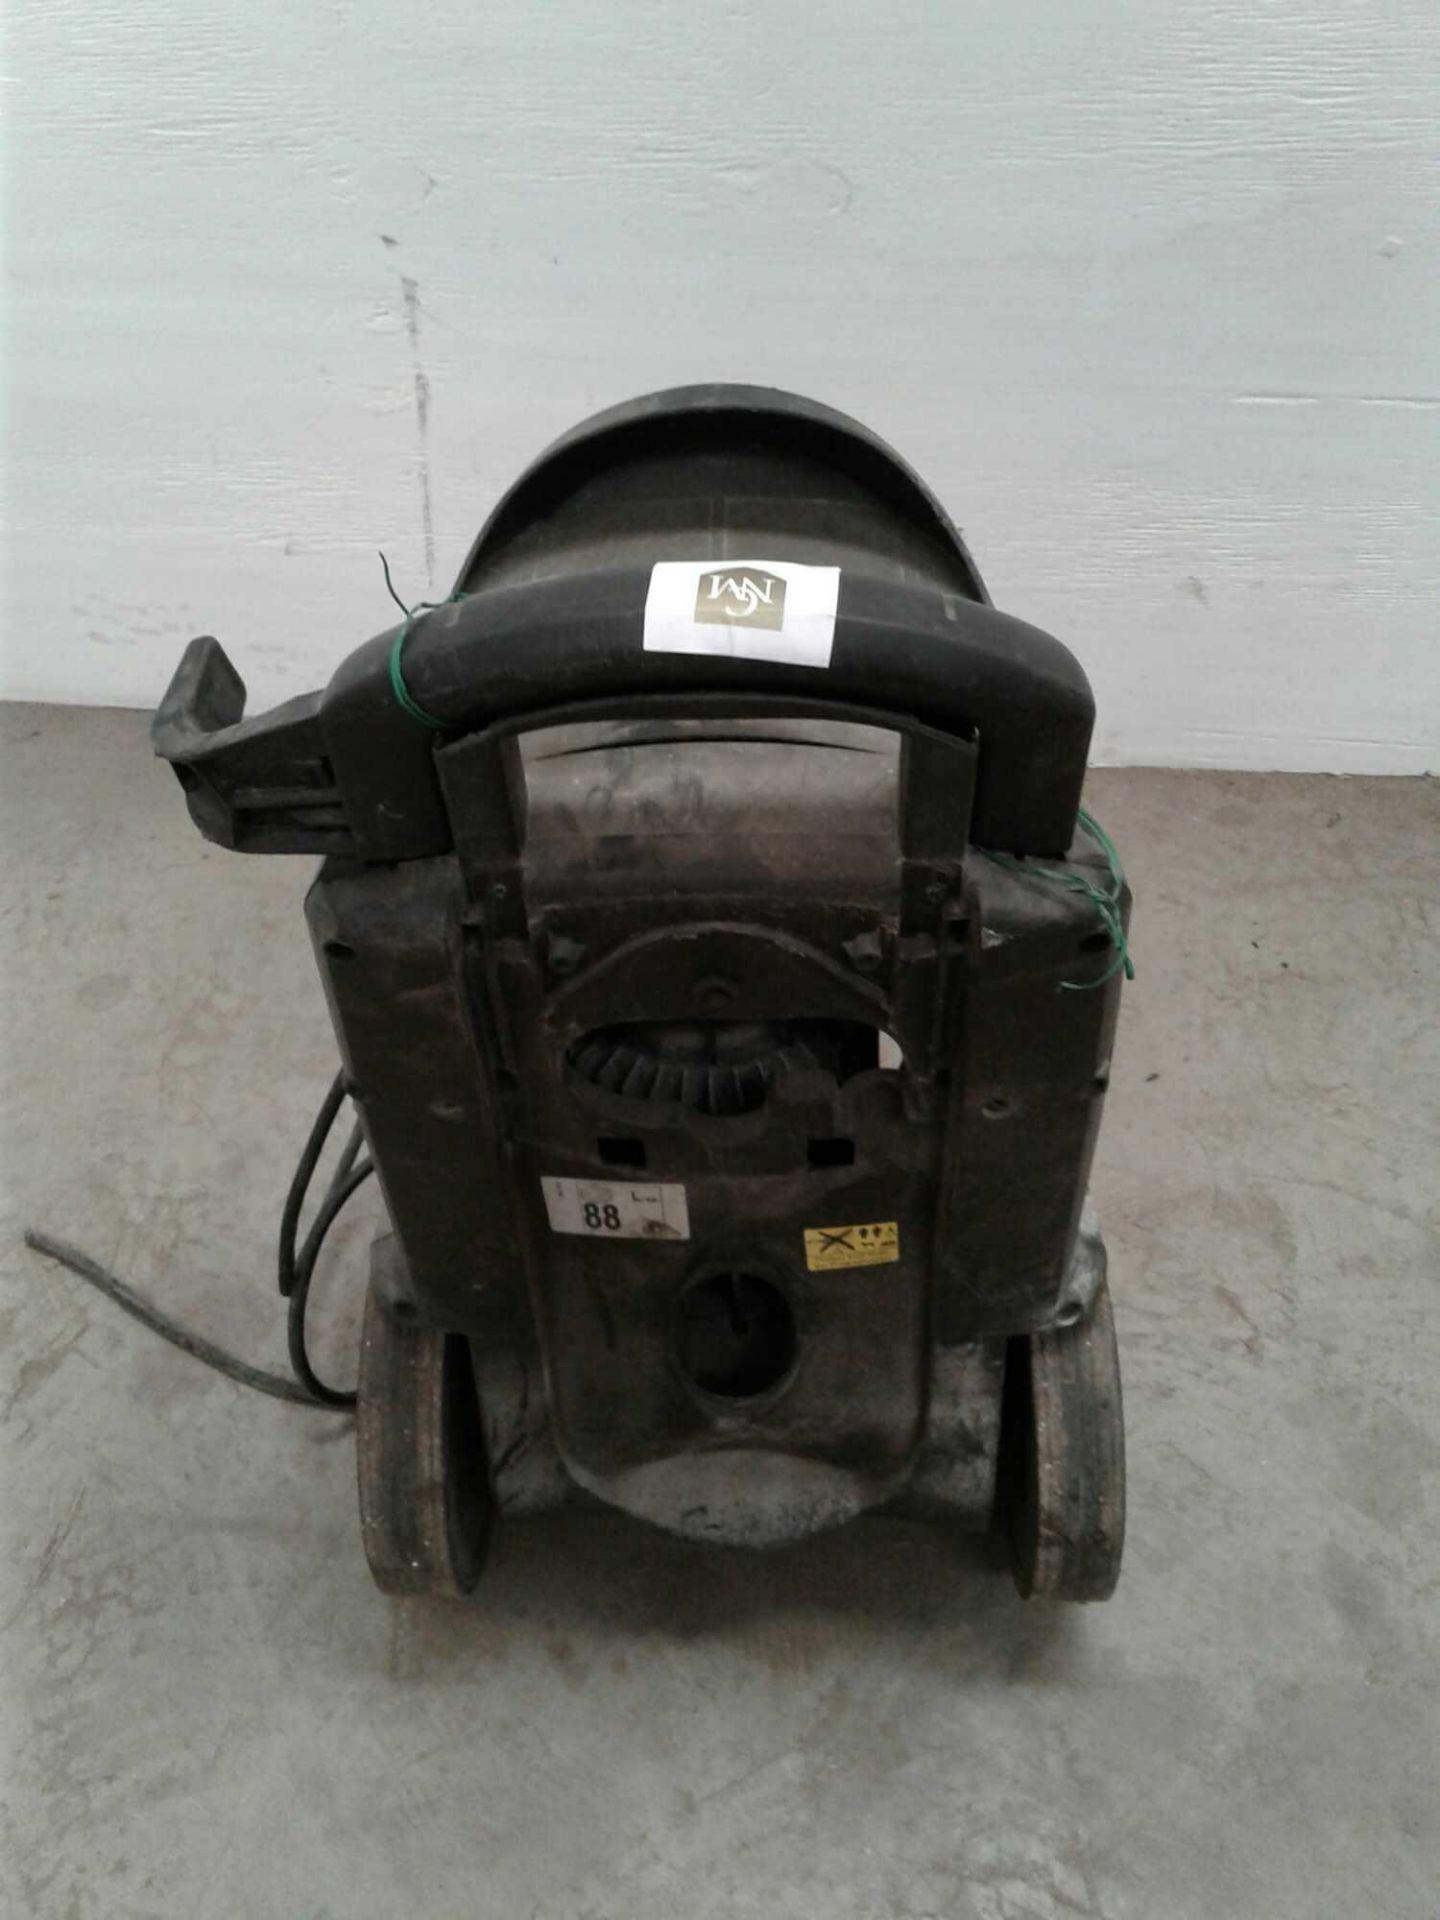 Lot 48 - Karcher power washer